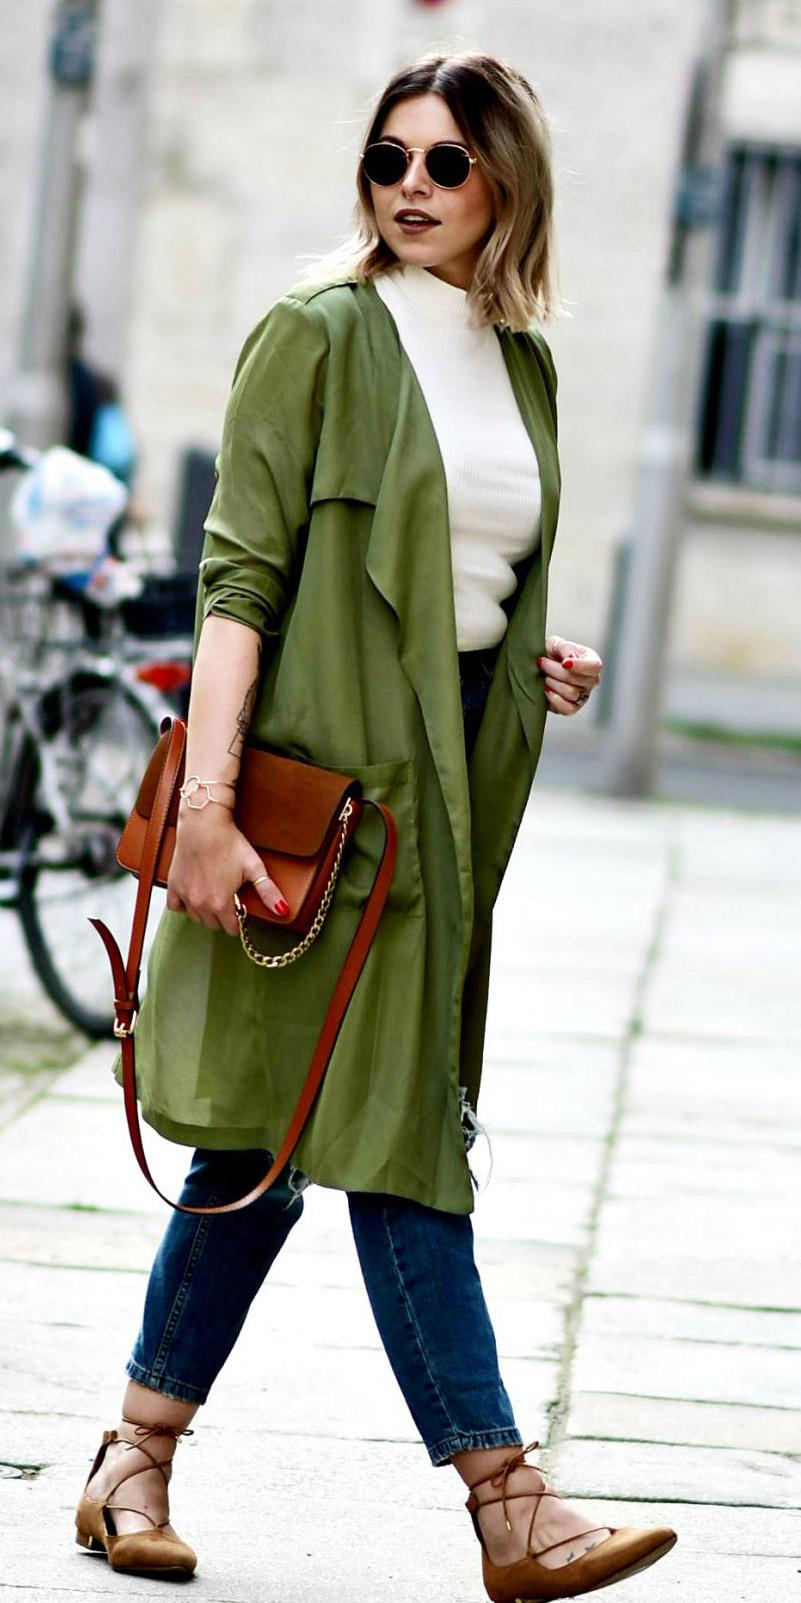 blue-navy-skinny-jeans-white-tee-turtleneck-lob-sun-blonde-cognac-bag-cognac-shoe-flats-green-olive-jacket-coat-trench-fall-winter-lunch.jpg